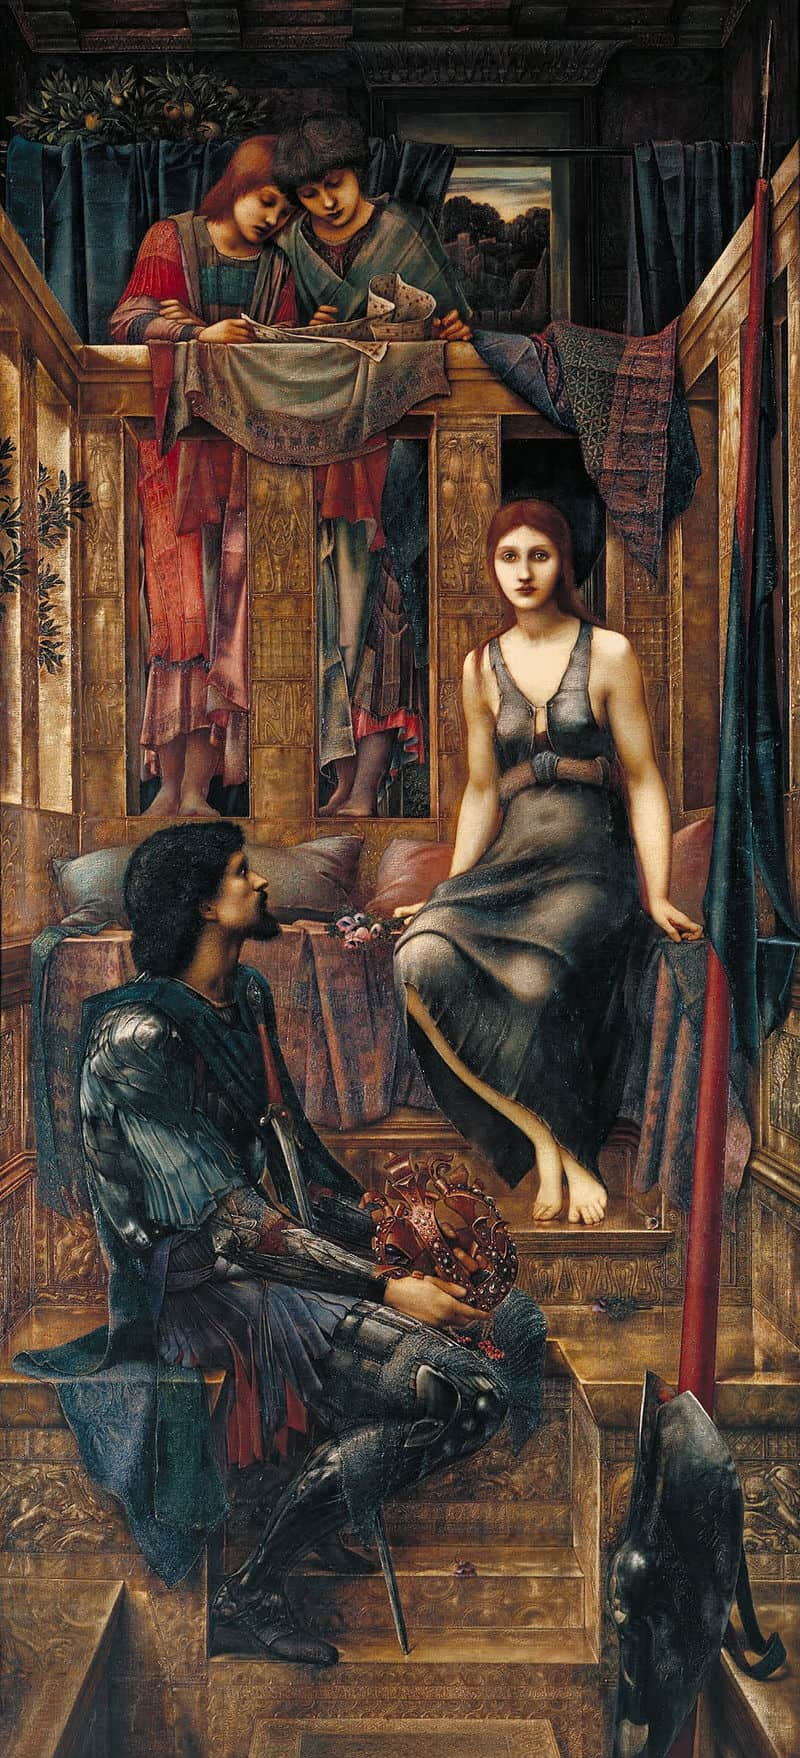 Edward_Burne-Jones_-_King_Cophetua_and_the_Beggar_Maid_-_Google_Art_Project